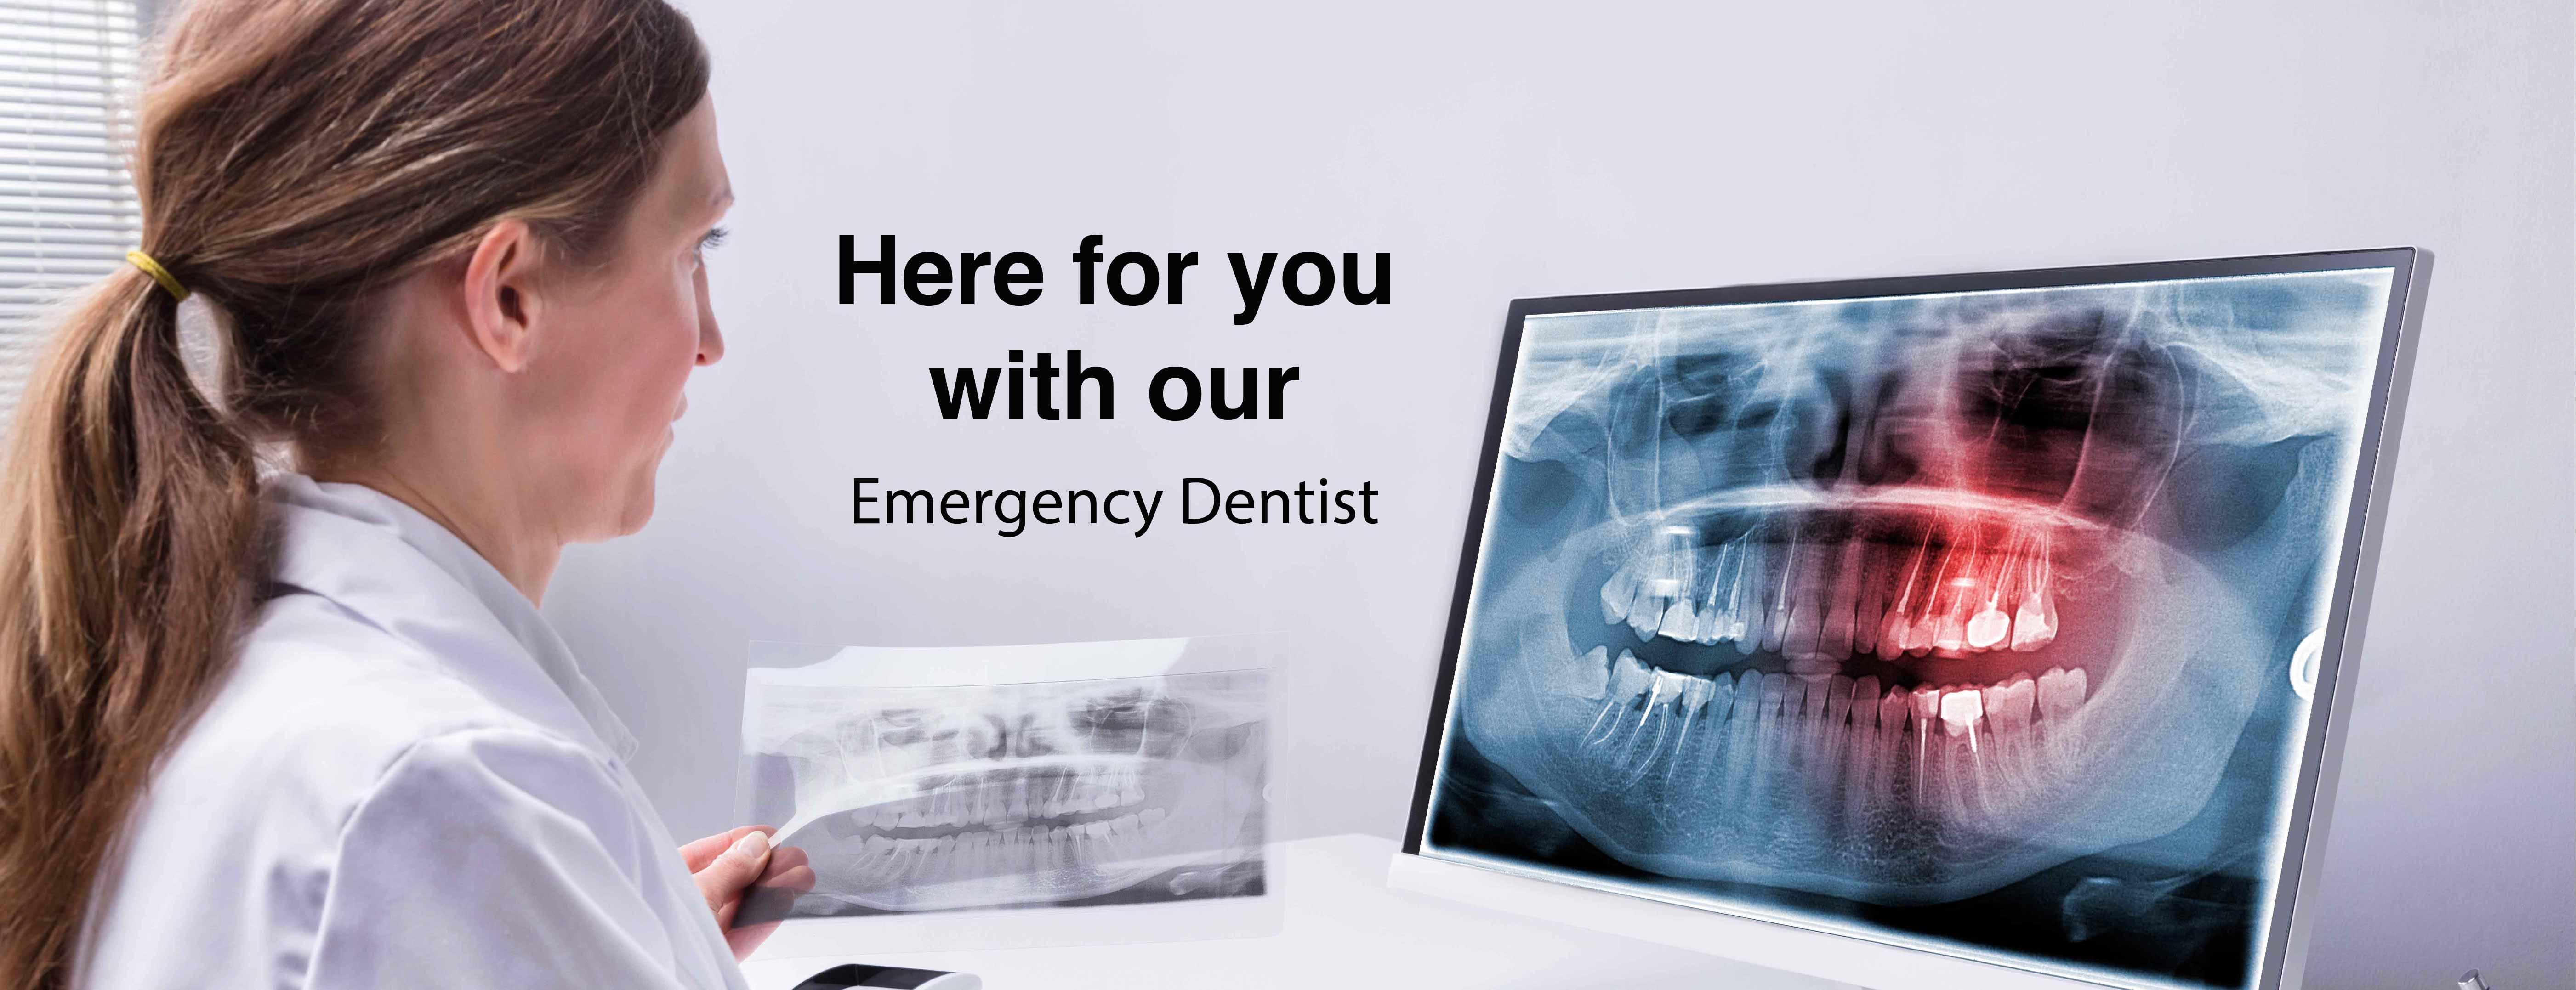 Emergency Dentist St Paul MN